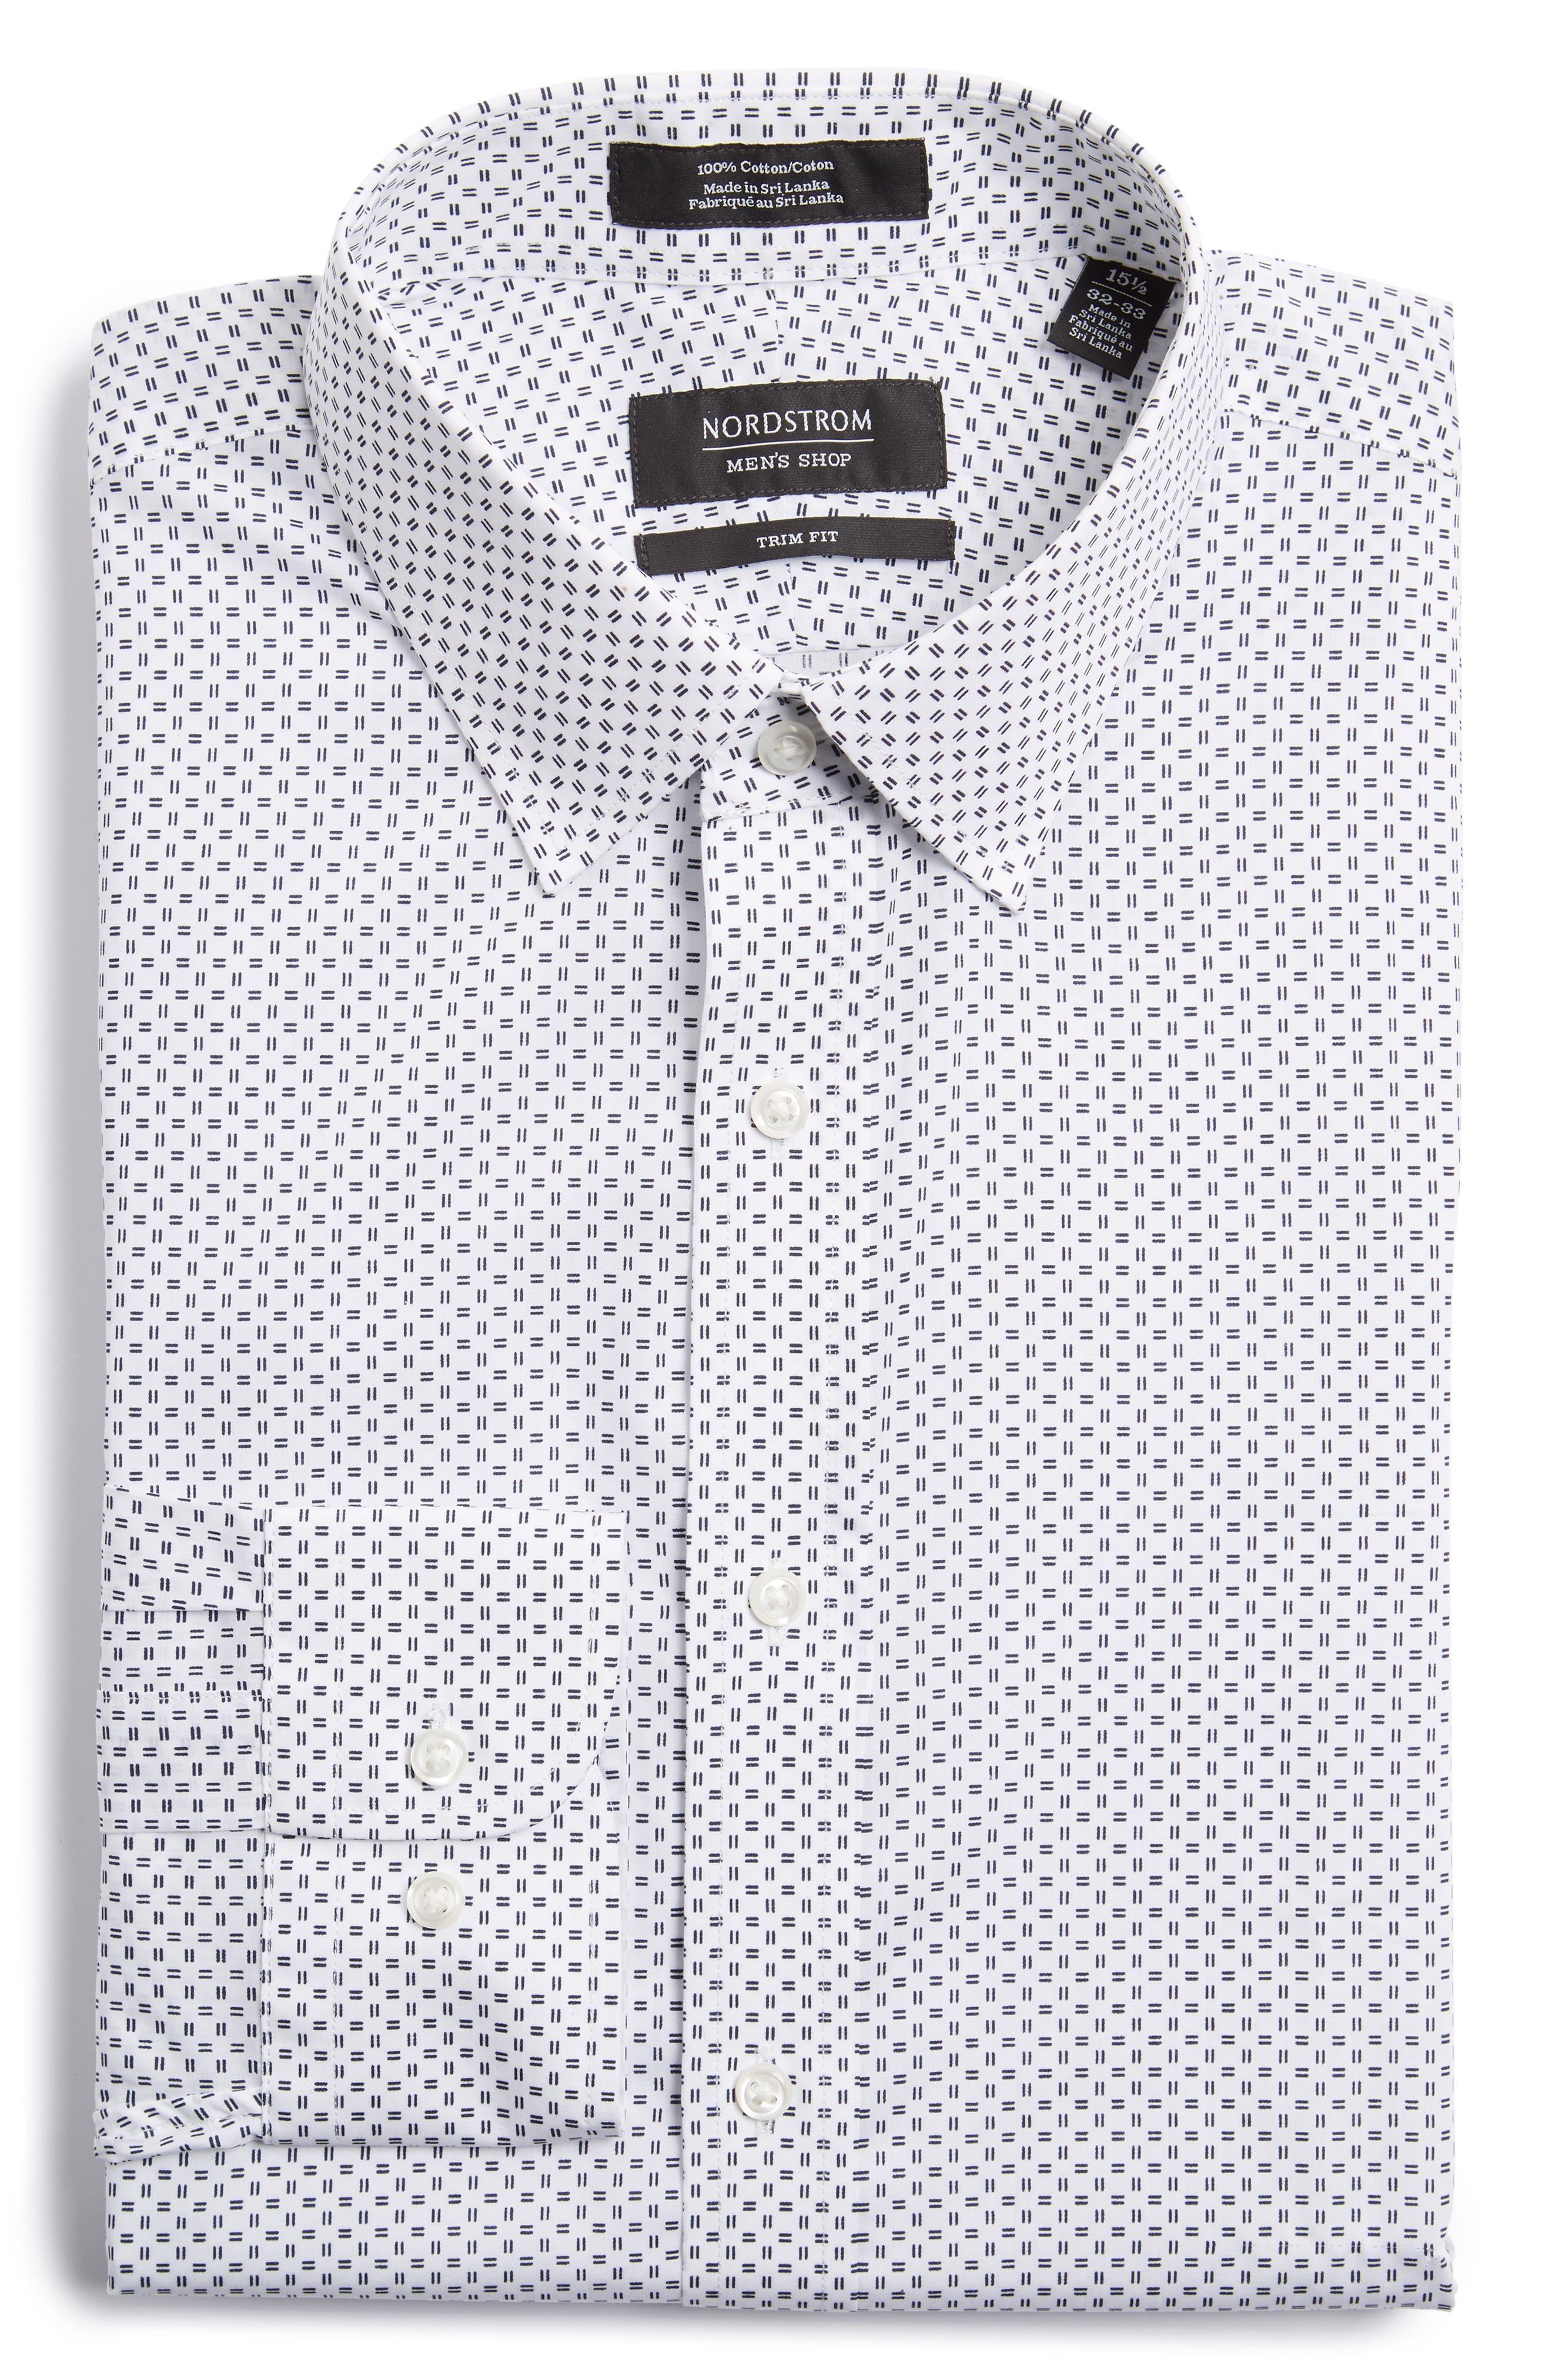 Nordstrom Men's Shop Trim Fit Print Dress Shirt